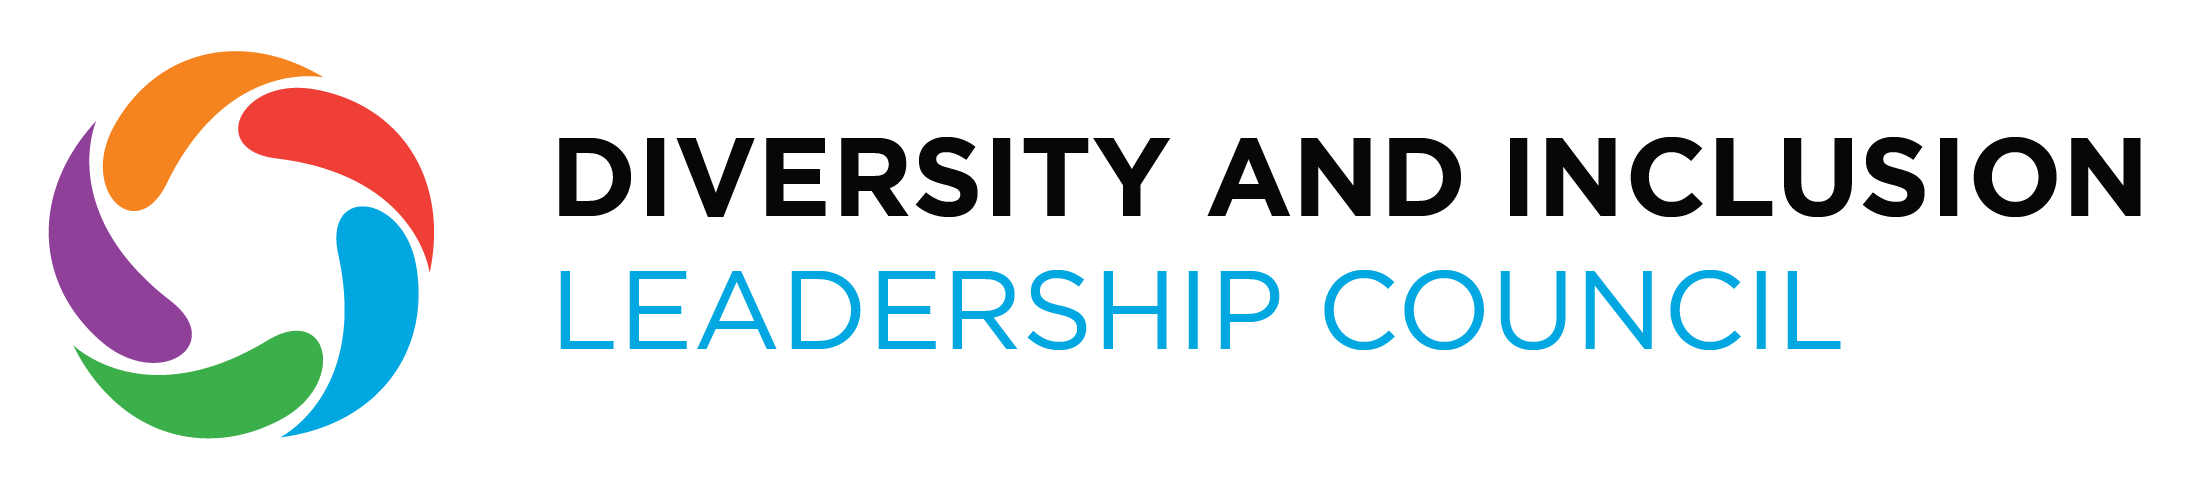 https://www.boardoftrade.com/programs/diversity-inclusion-leadership-council